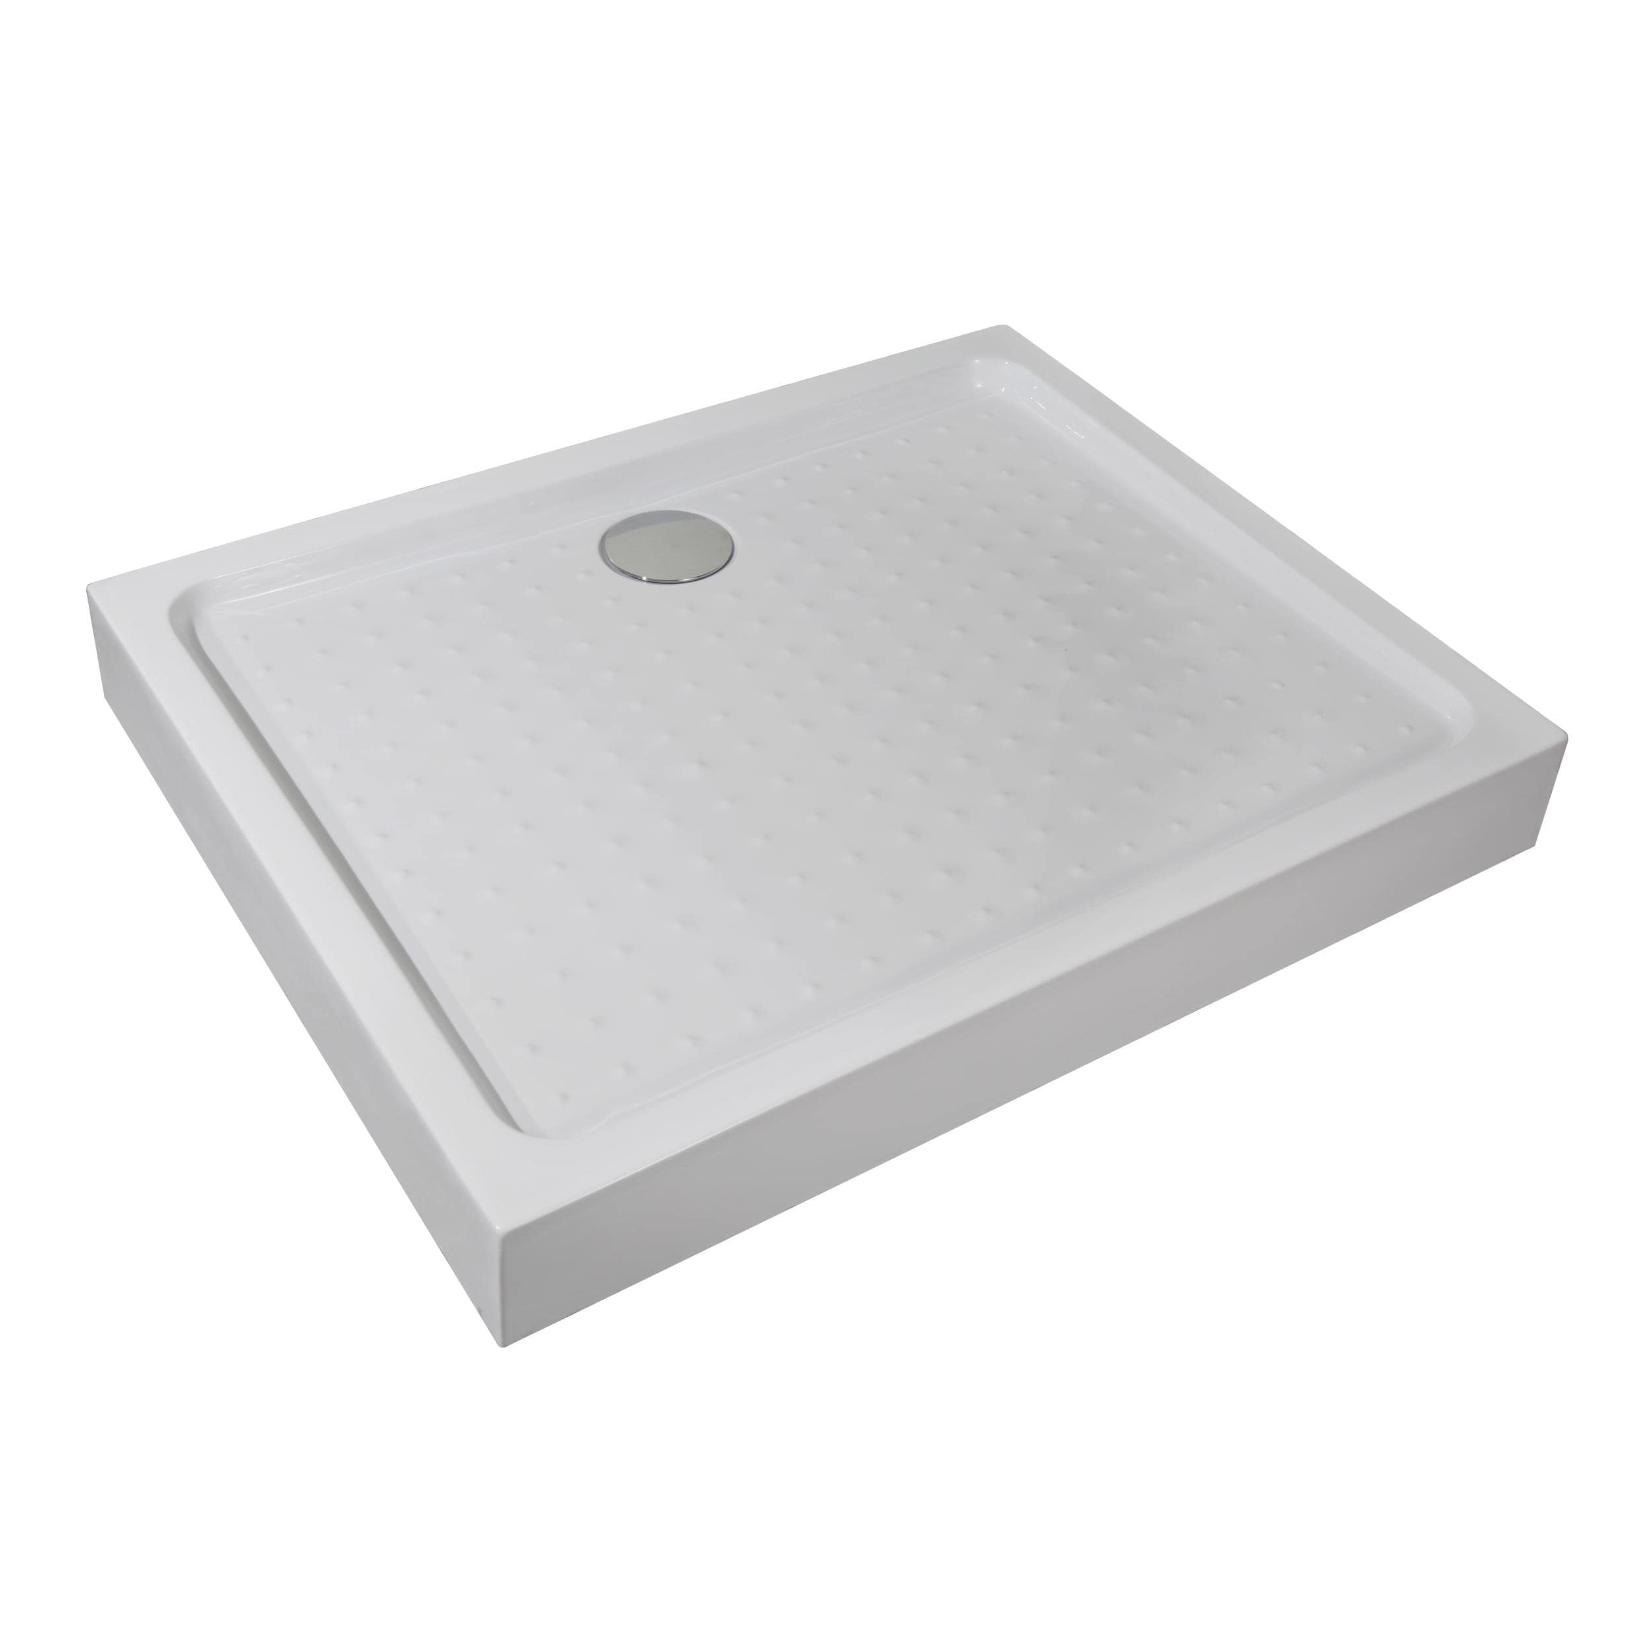 Cadita de dus Sanotechnik, ABS, alb lucios, dreptunghiulara, 70 x 90 x 12.5 cm imagine 2021 mathaus